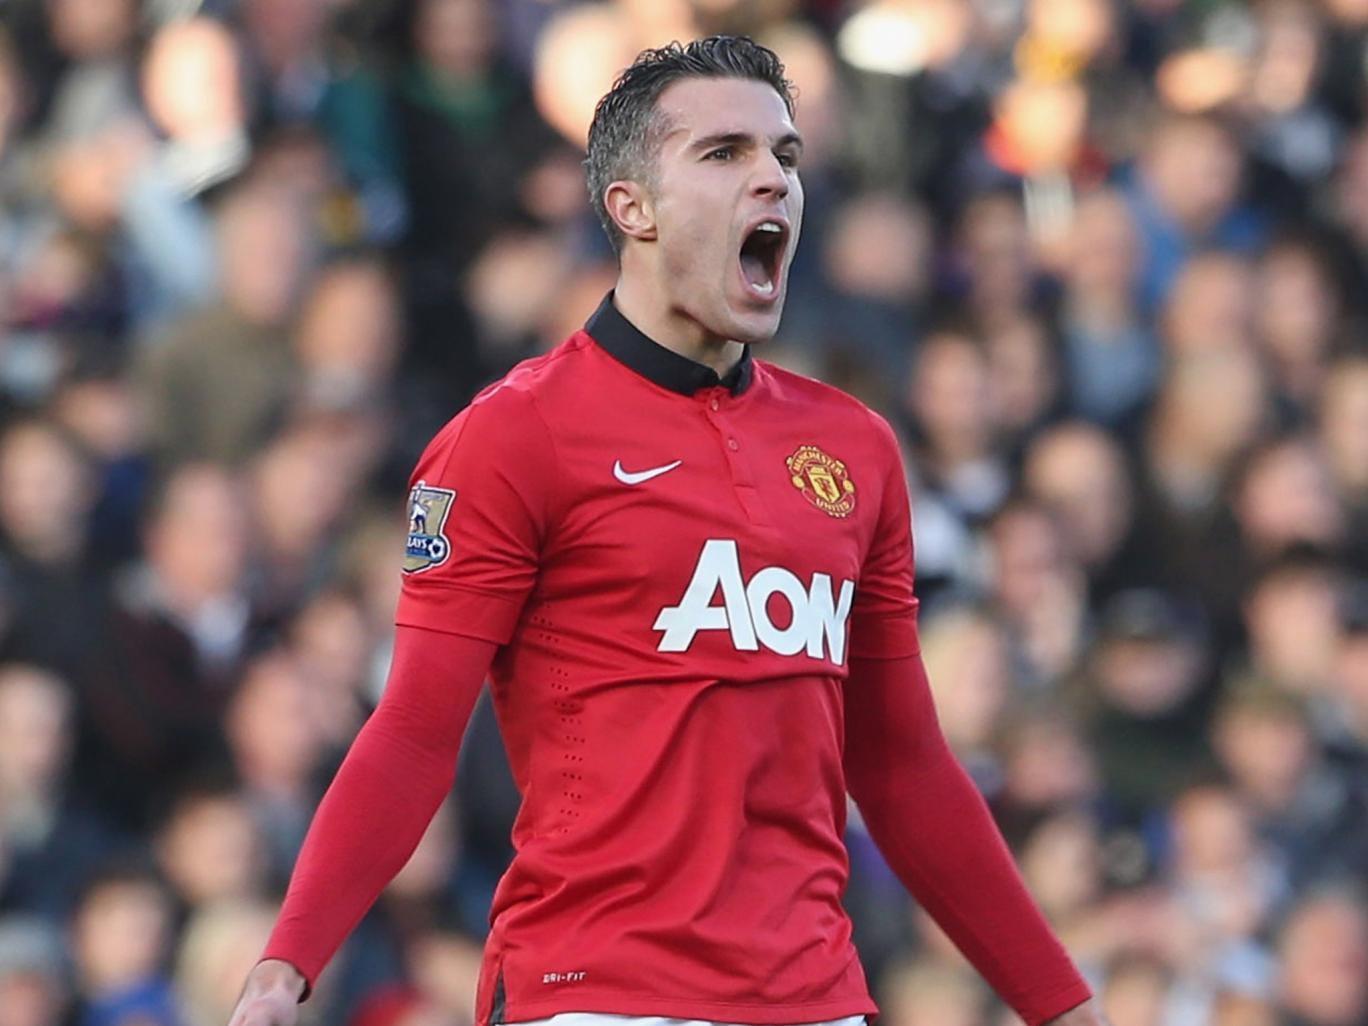 Robin van Persie celebrates after scoring for Manchester United